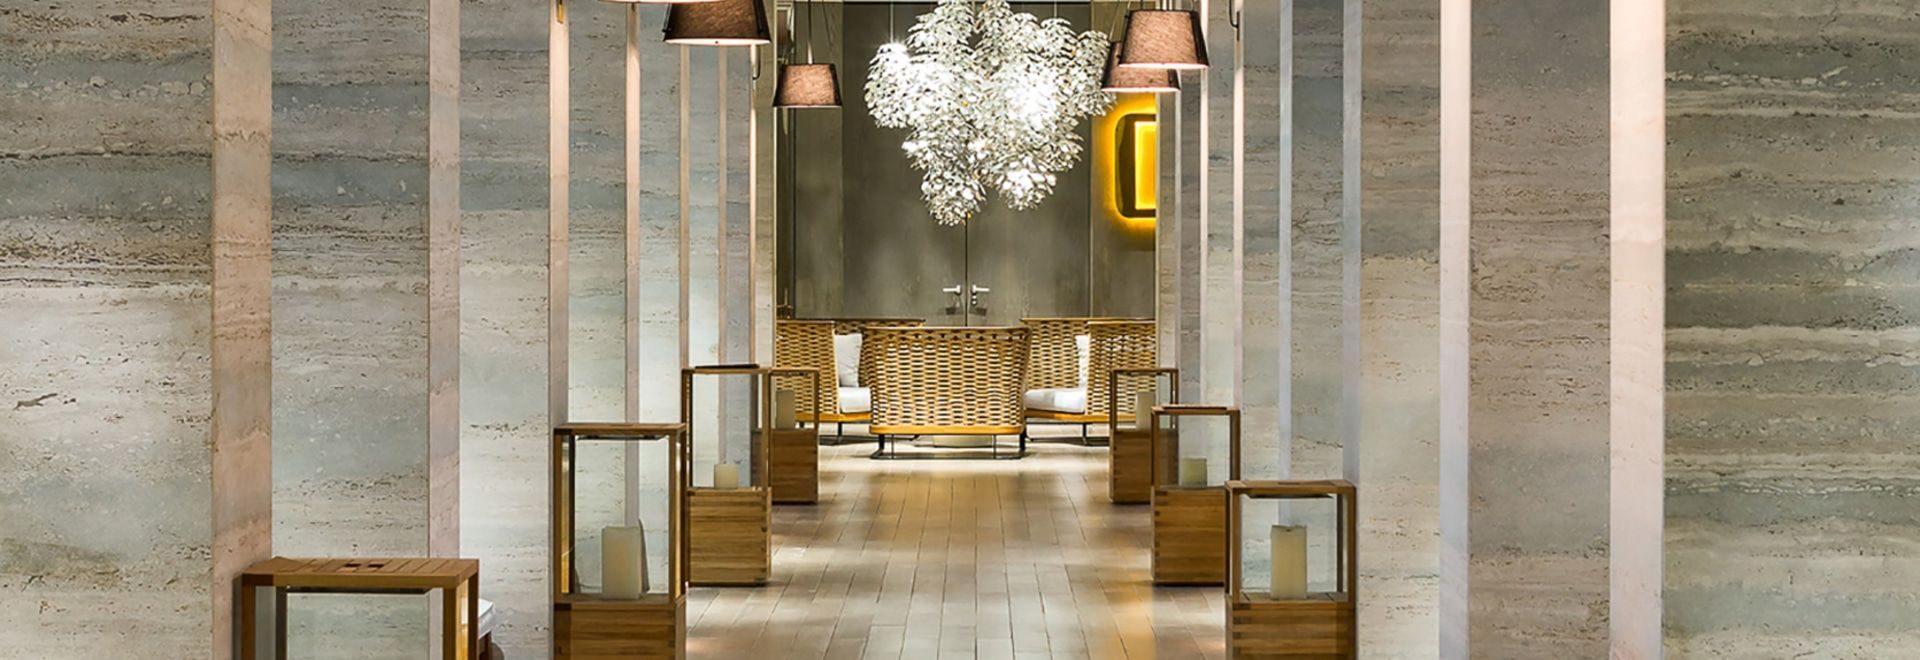 TRIBÙ LANTERNS AT THE W-HOTEL GUANGZHOU